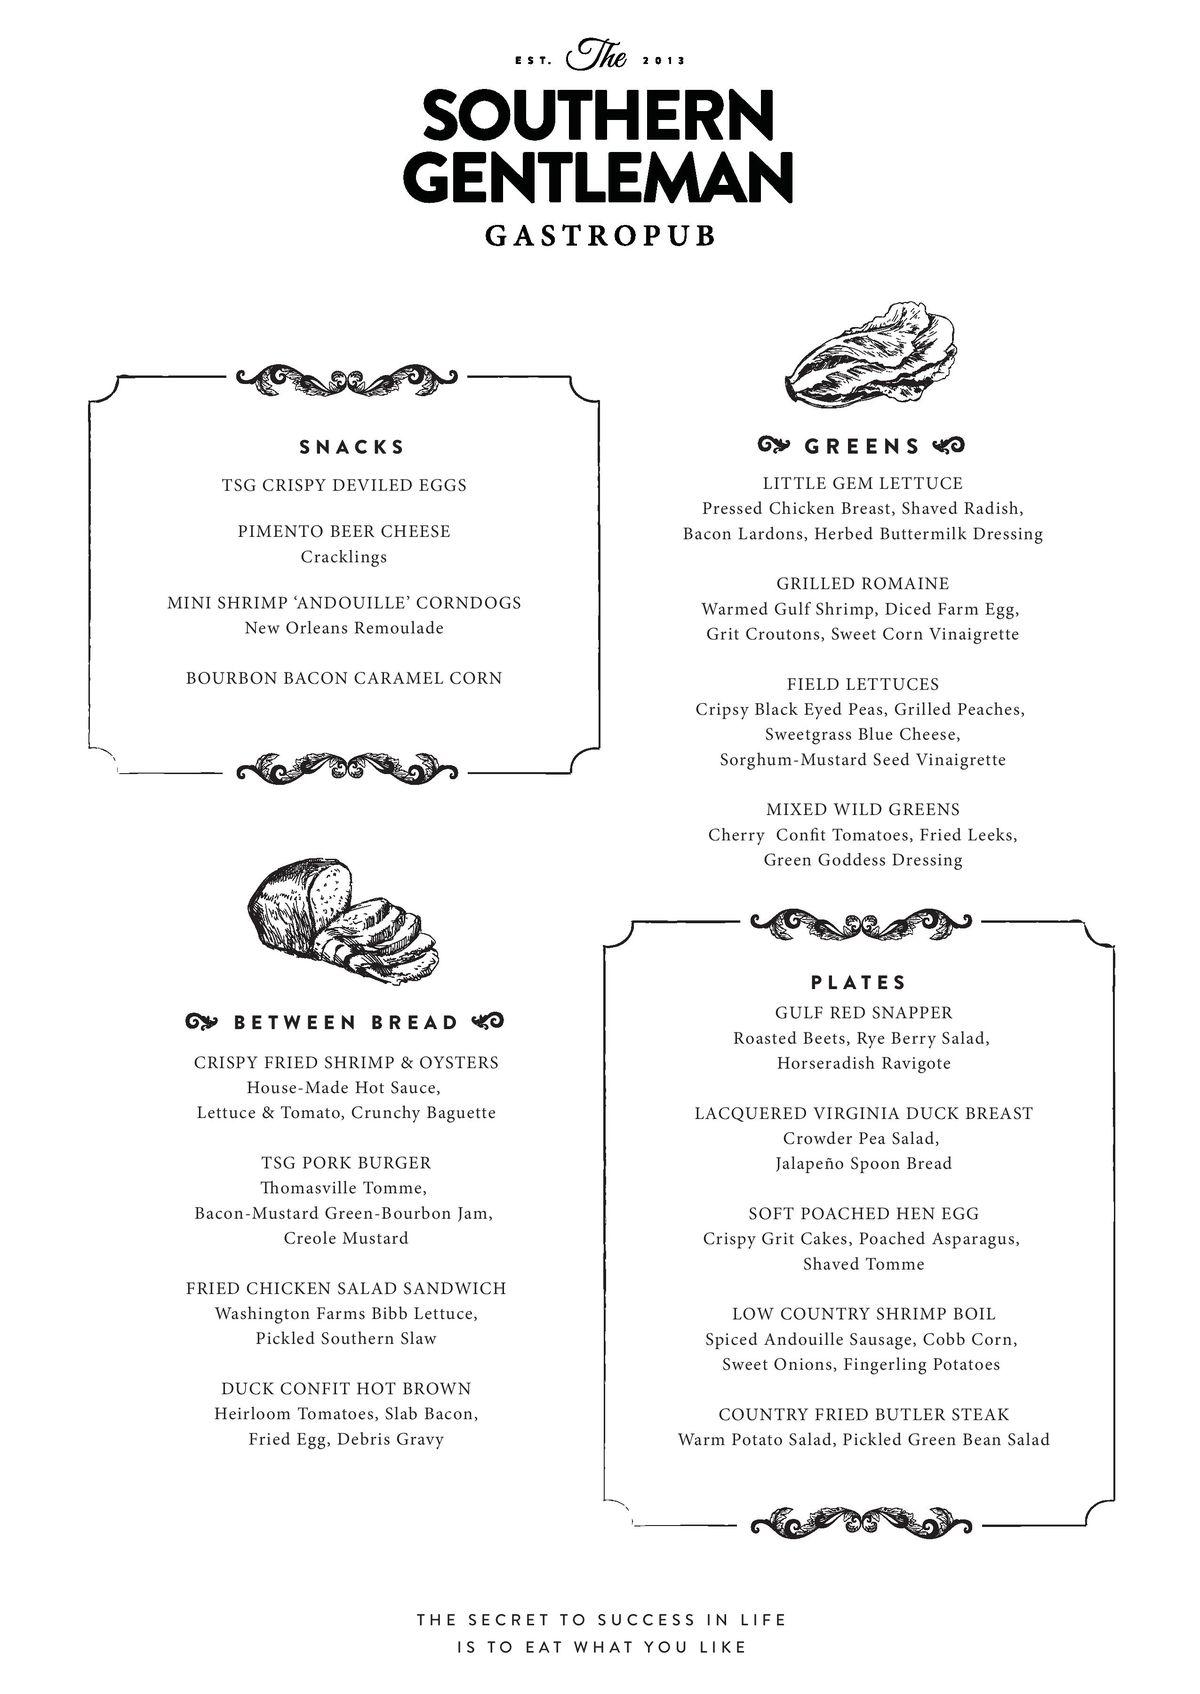 The Southern Gentleman lunch menu